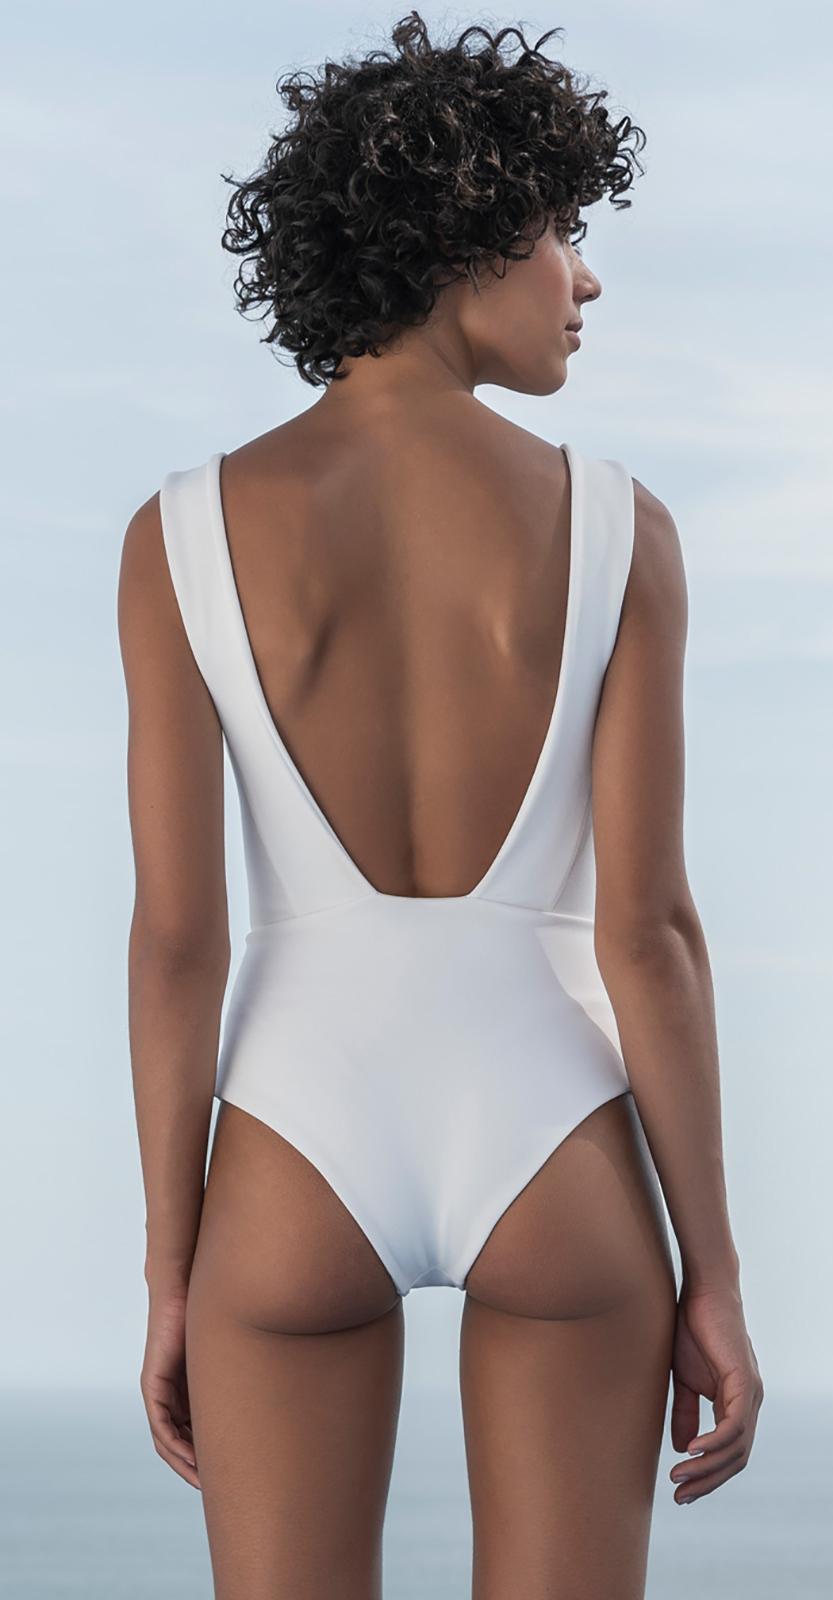 037d900816bb6 ... White tricot knit one-piece swimsuit - MAIÔ AMANDA TRICOT OFF WHITE ...